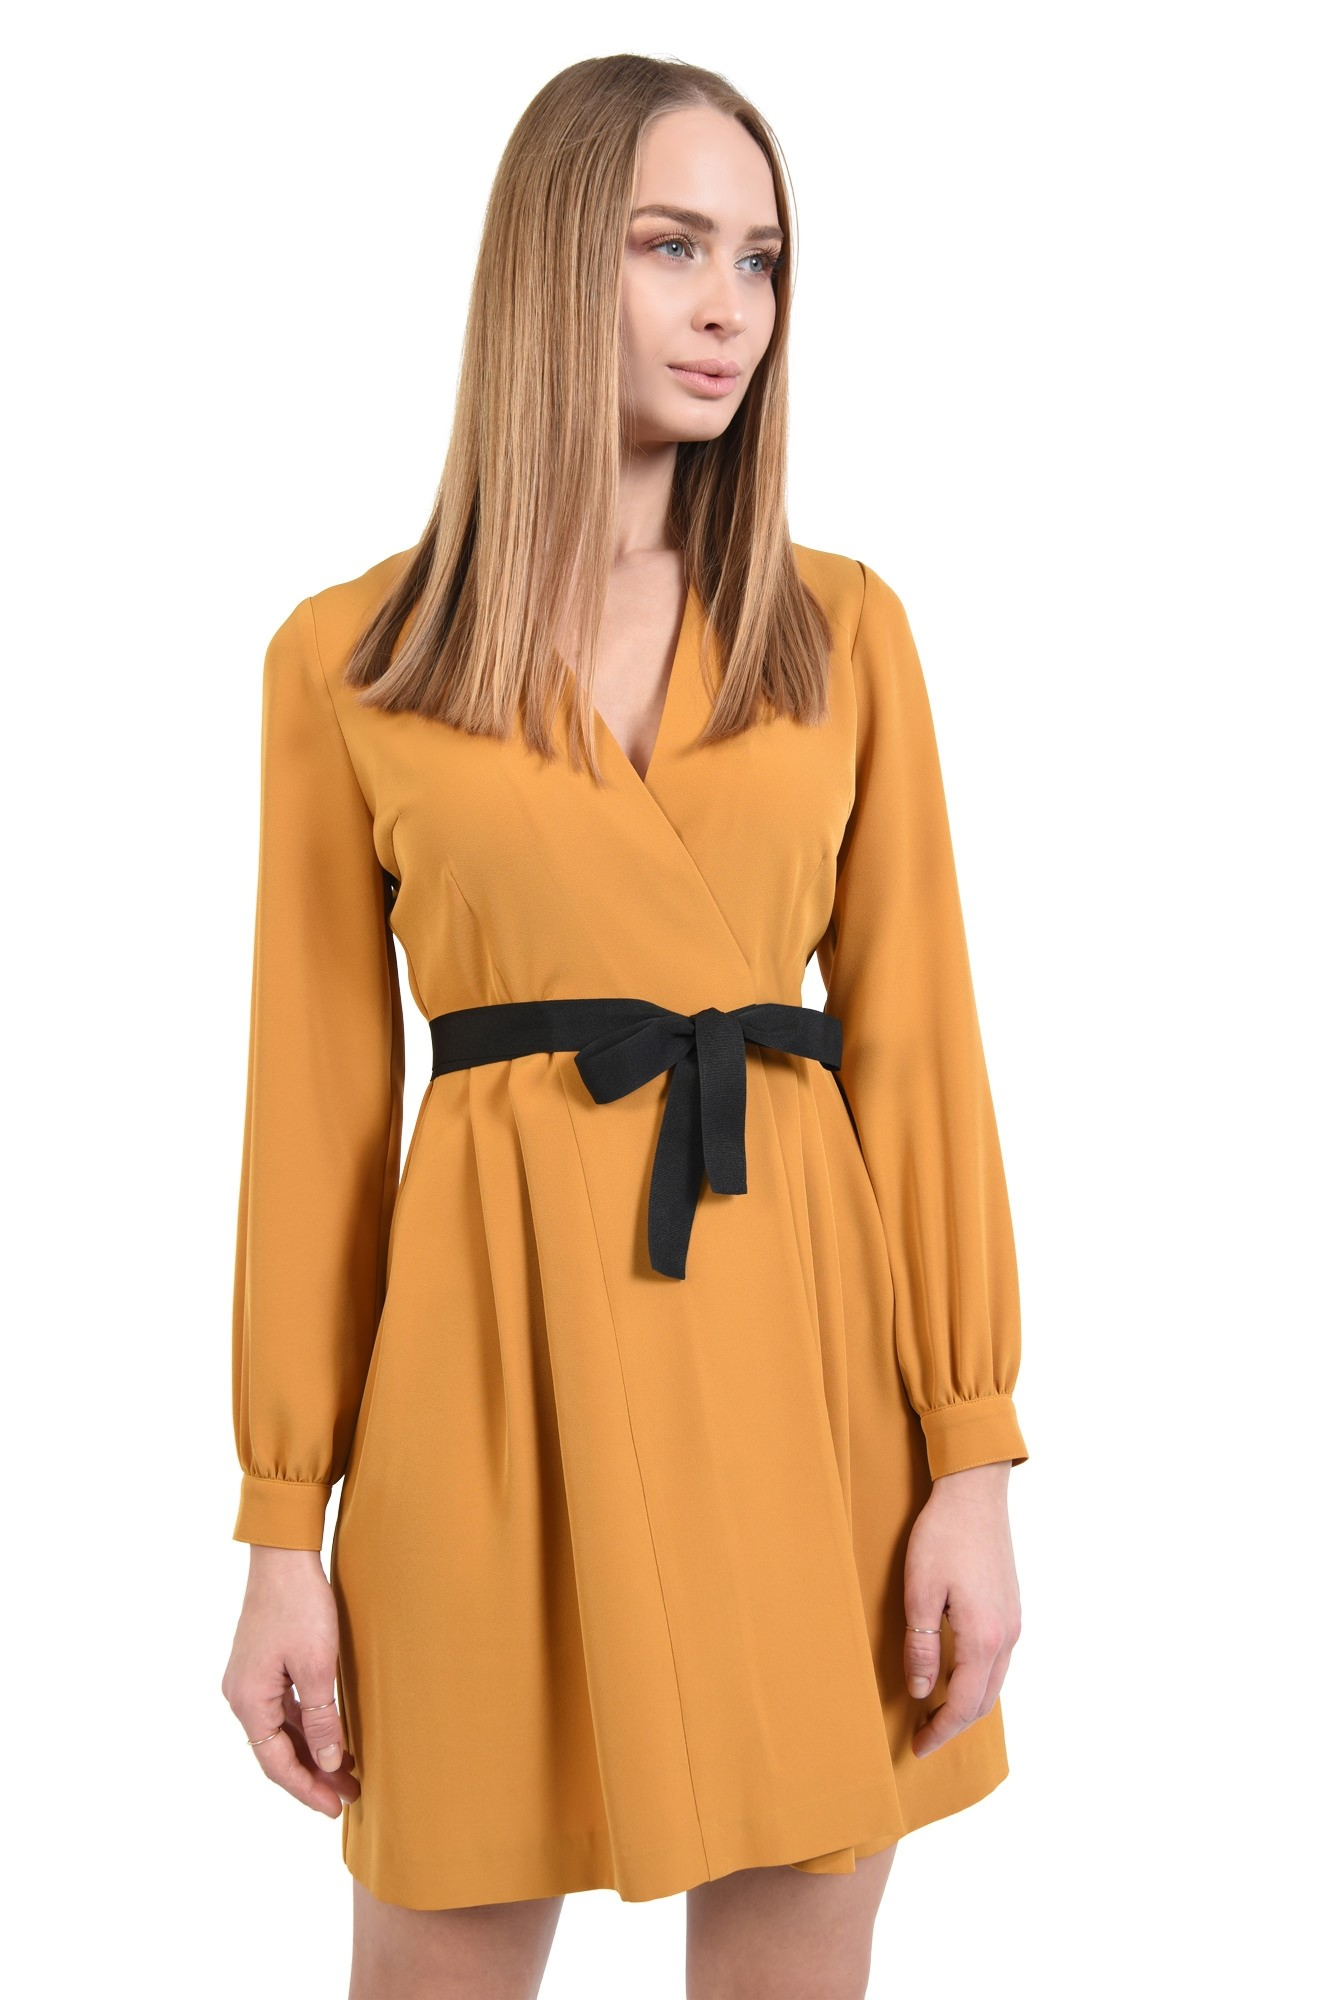 0 - rochie mustar, anchior petrecut, maneci lungi cu manseta, croi parte peste parte